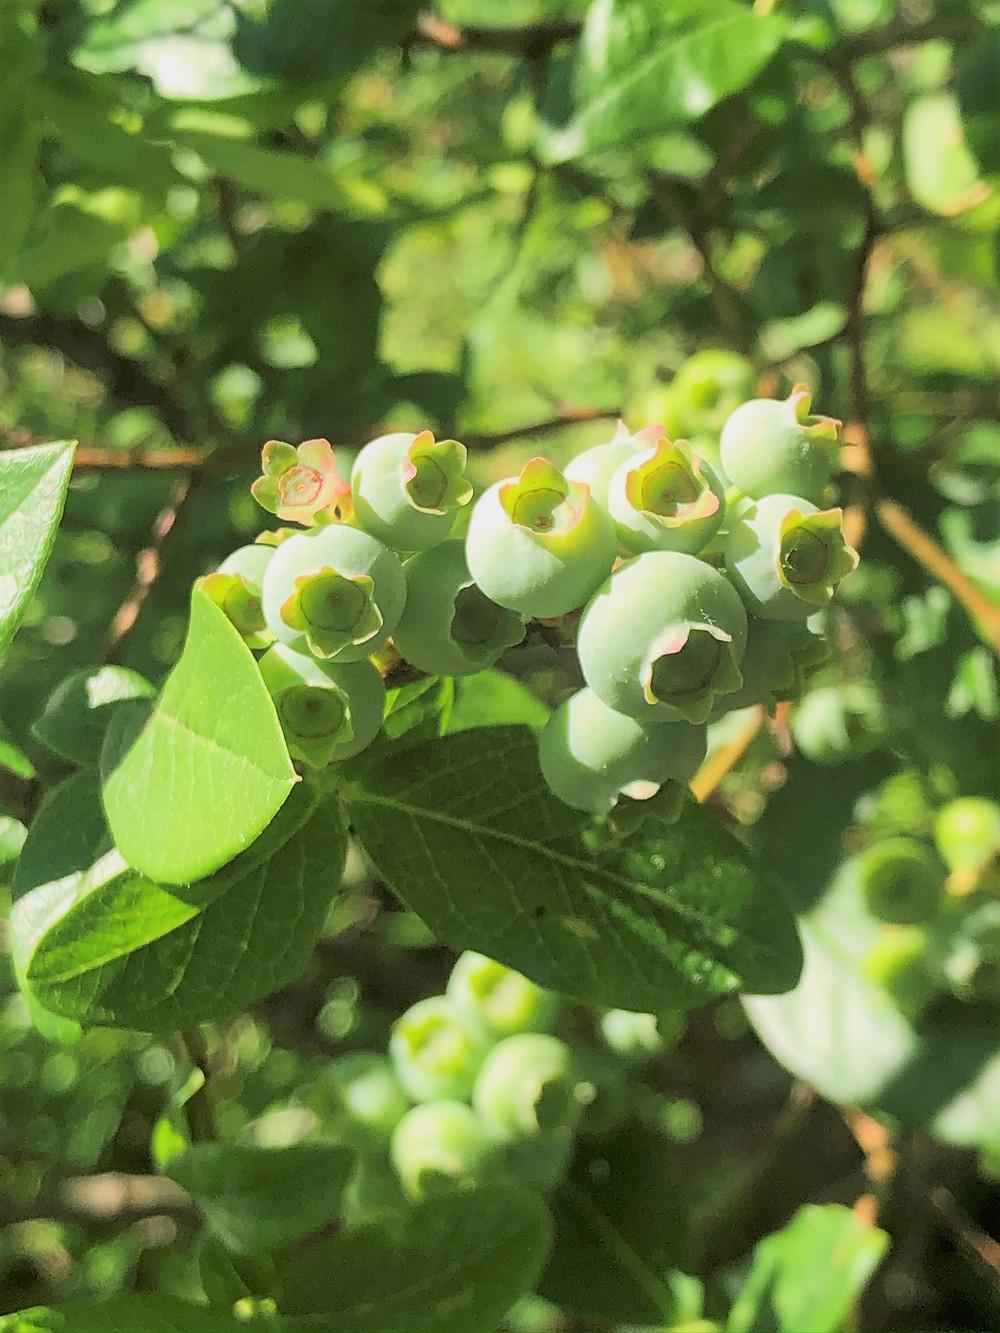 Wild blueberries at Snake Pond in Gardner, MA